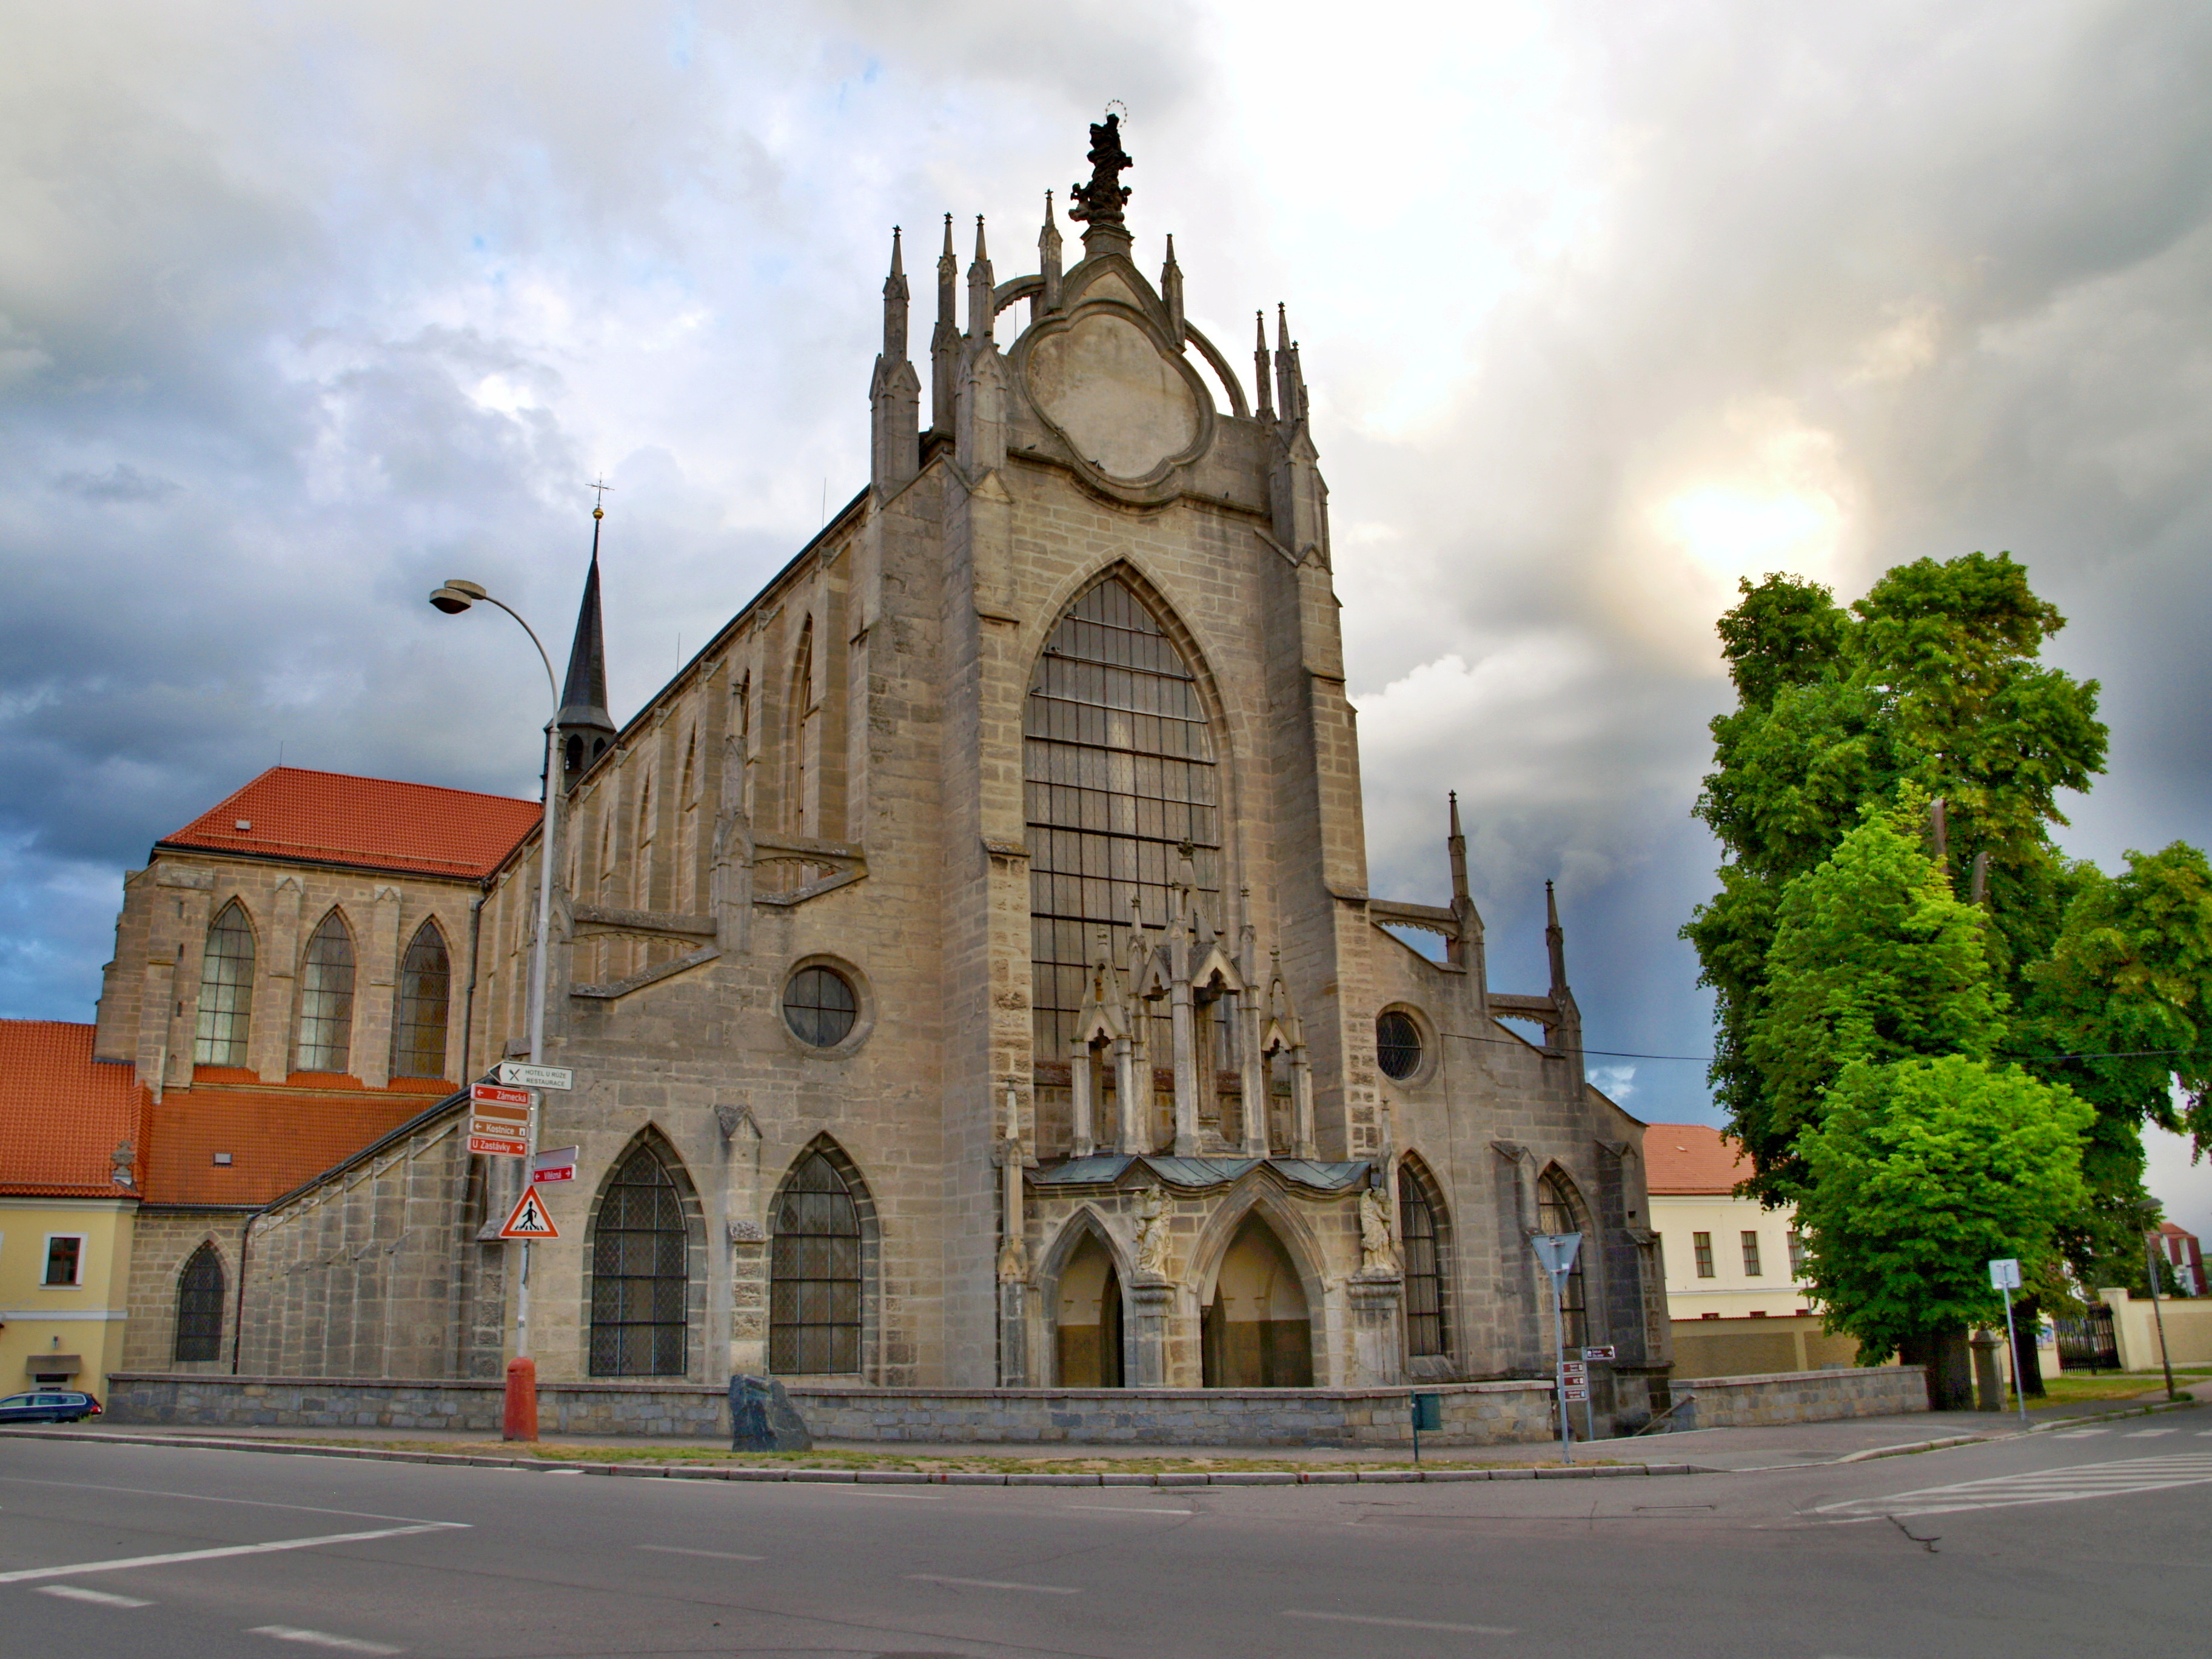 6202-katedrala-nanebevzeti-panny-marie-a-sv-jana-krtitele-cathedral-of-assumption-of-our-lady-and-st-john-the-baptist.jpg